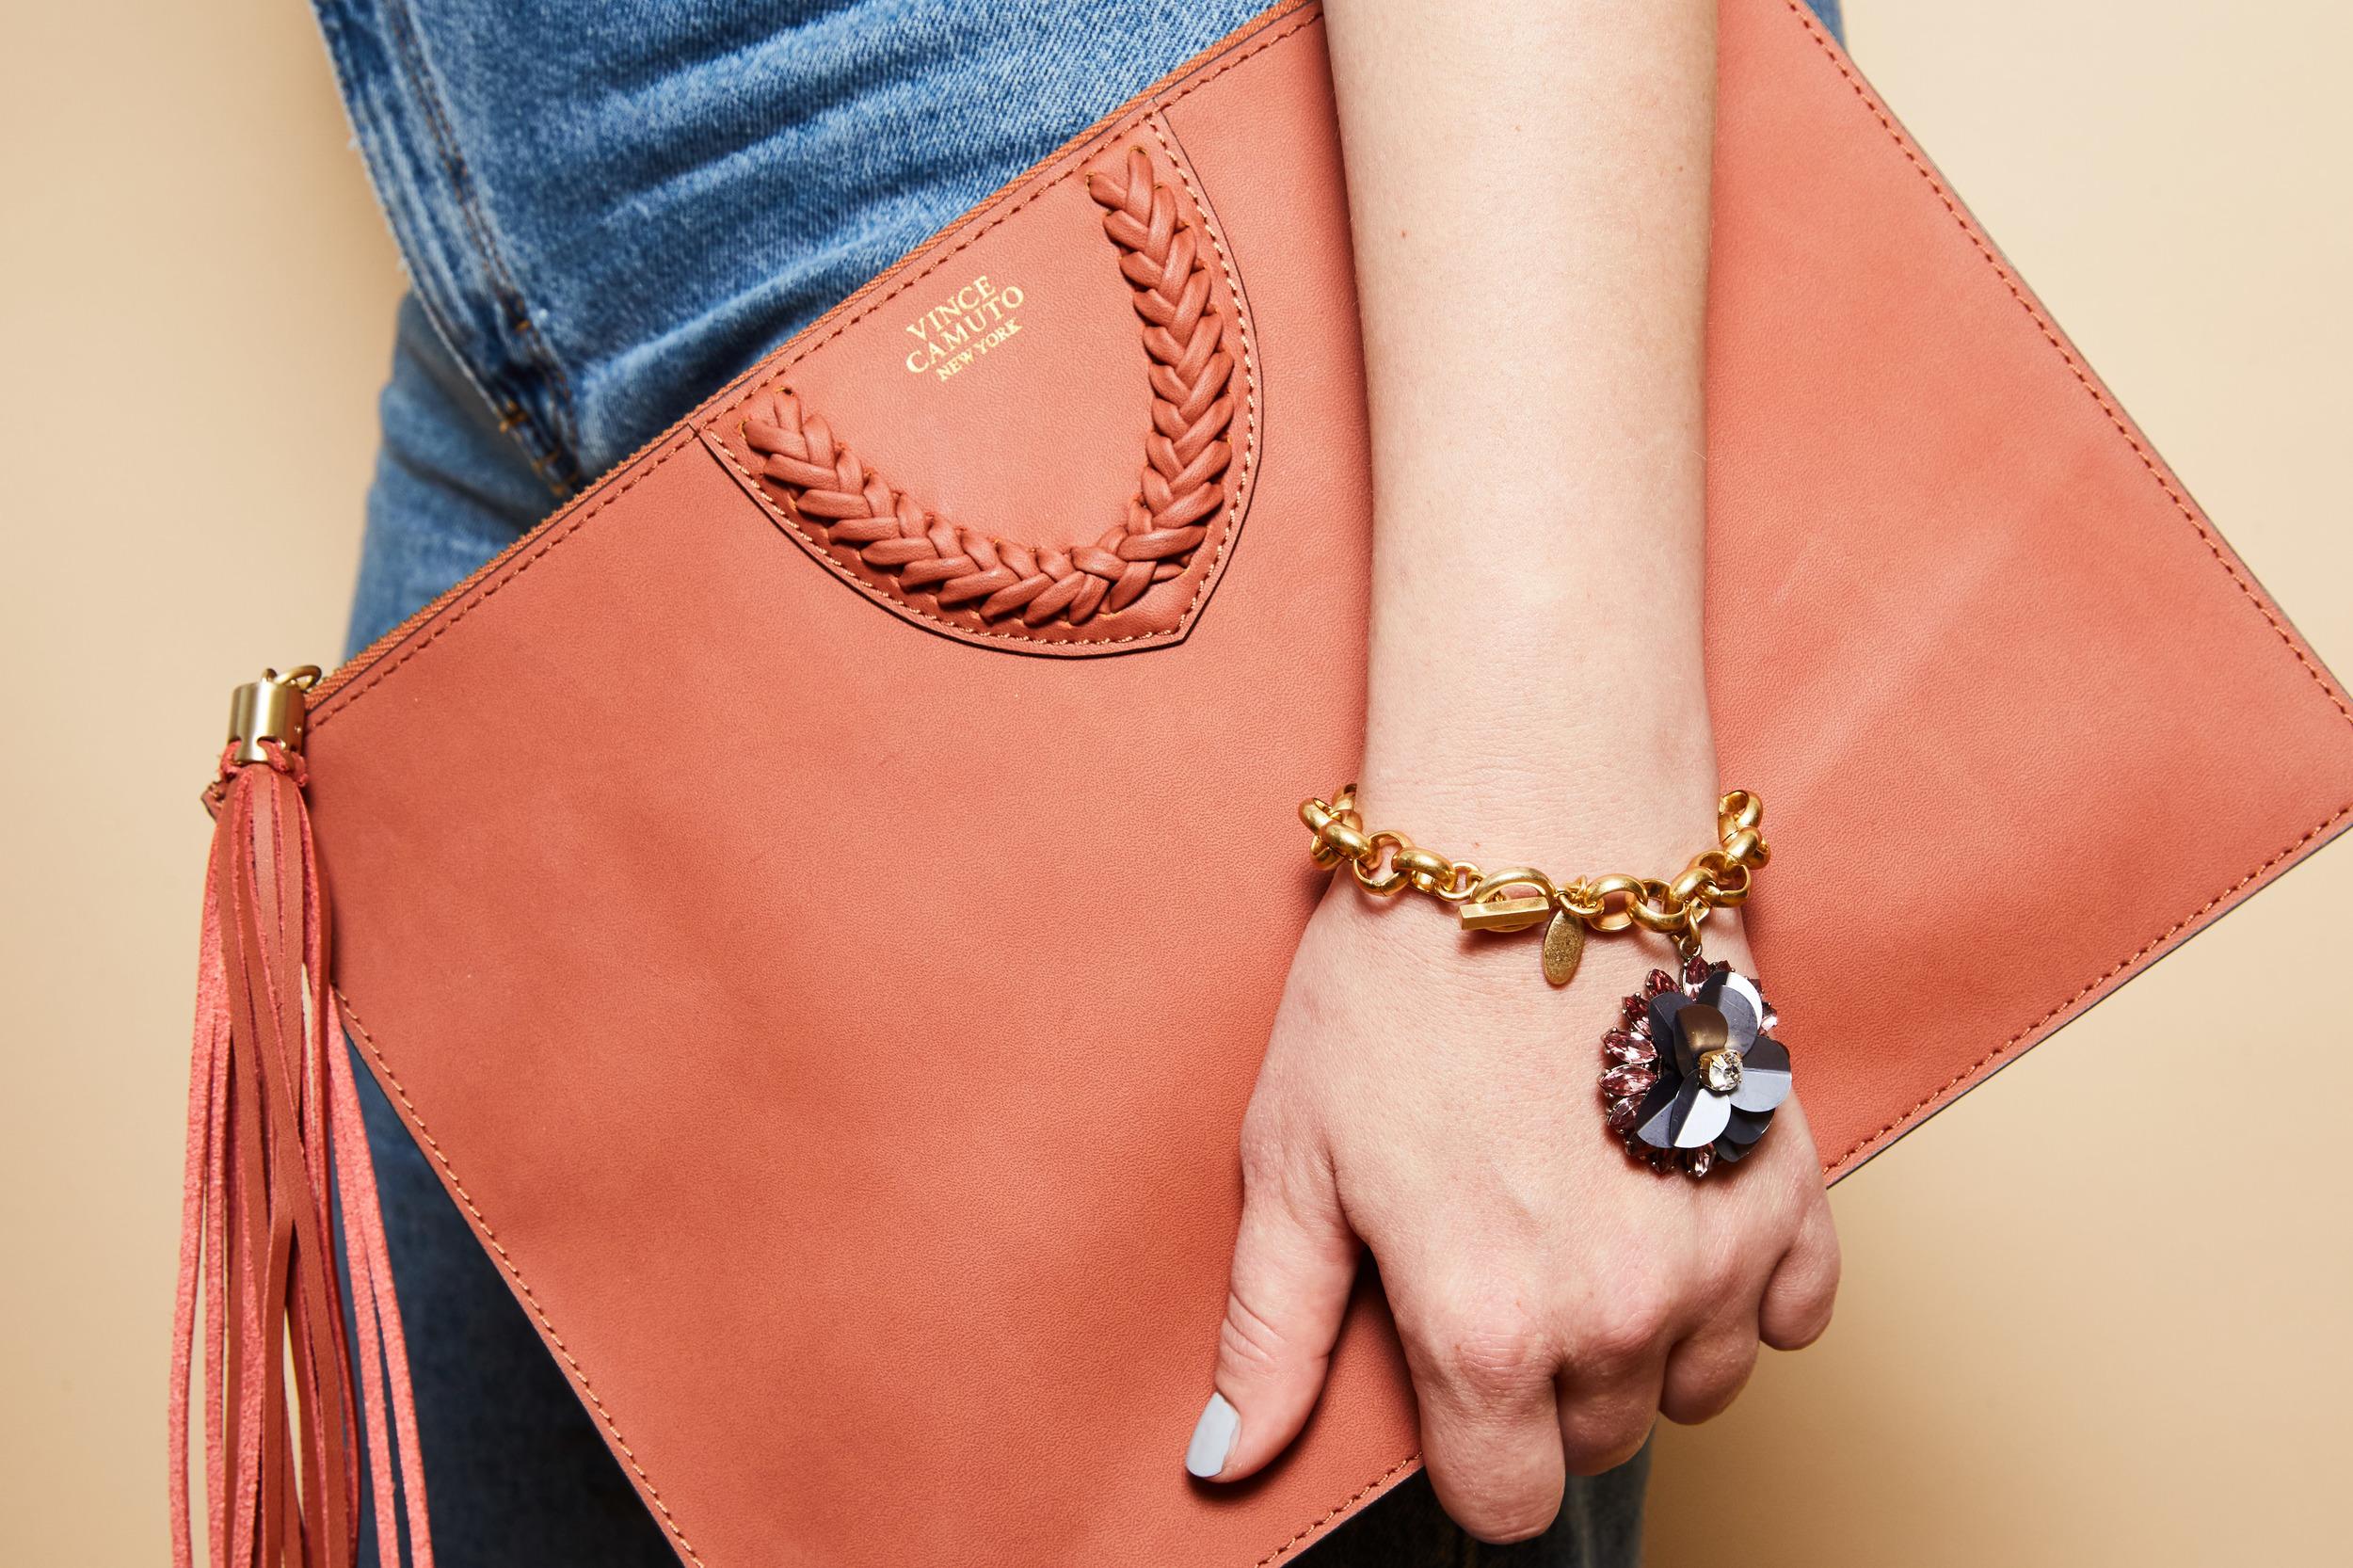 Vince Camuto clutch, $148;  vincecamuto.com . Ann Taylor bracelet, $49.50 (avail 9/2);  anntaylor.com .  Photographed by  Lauren Perlstein .